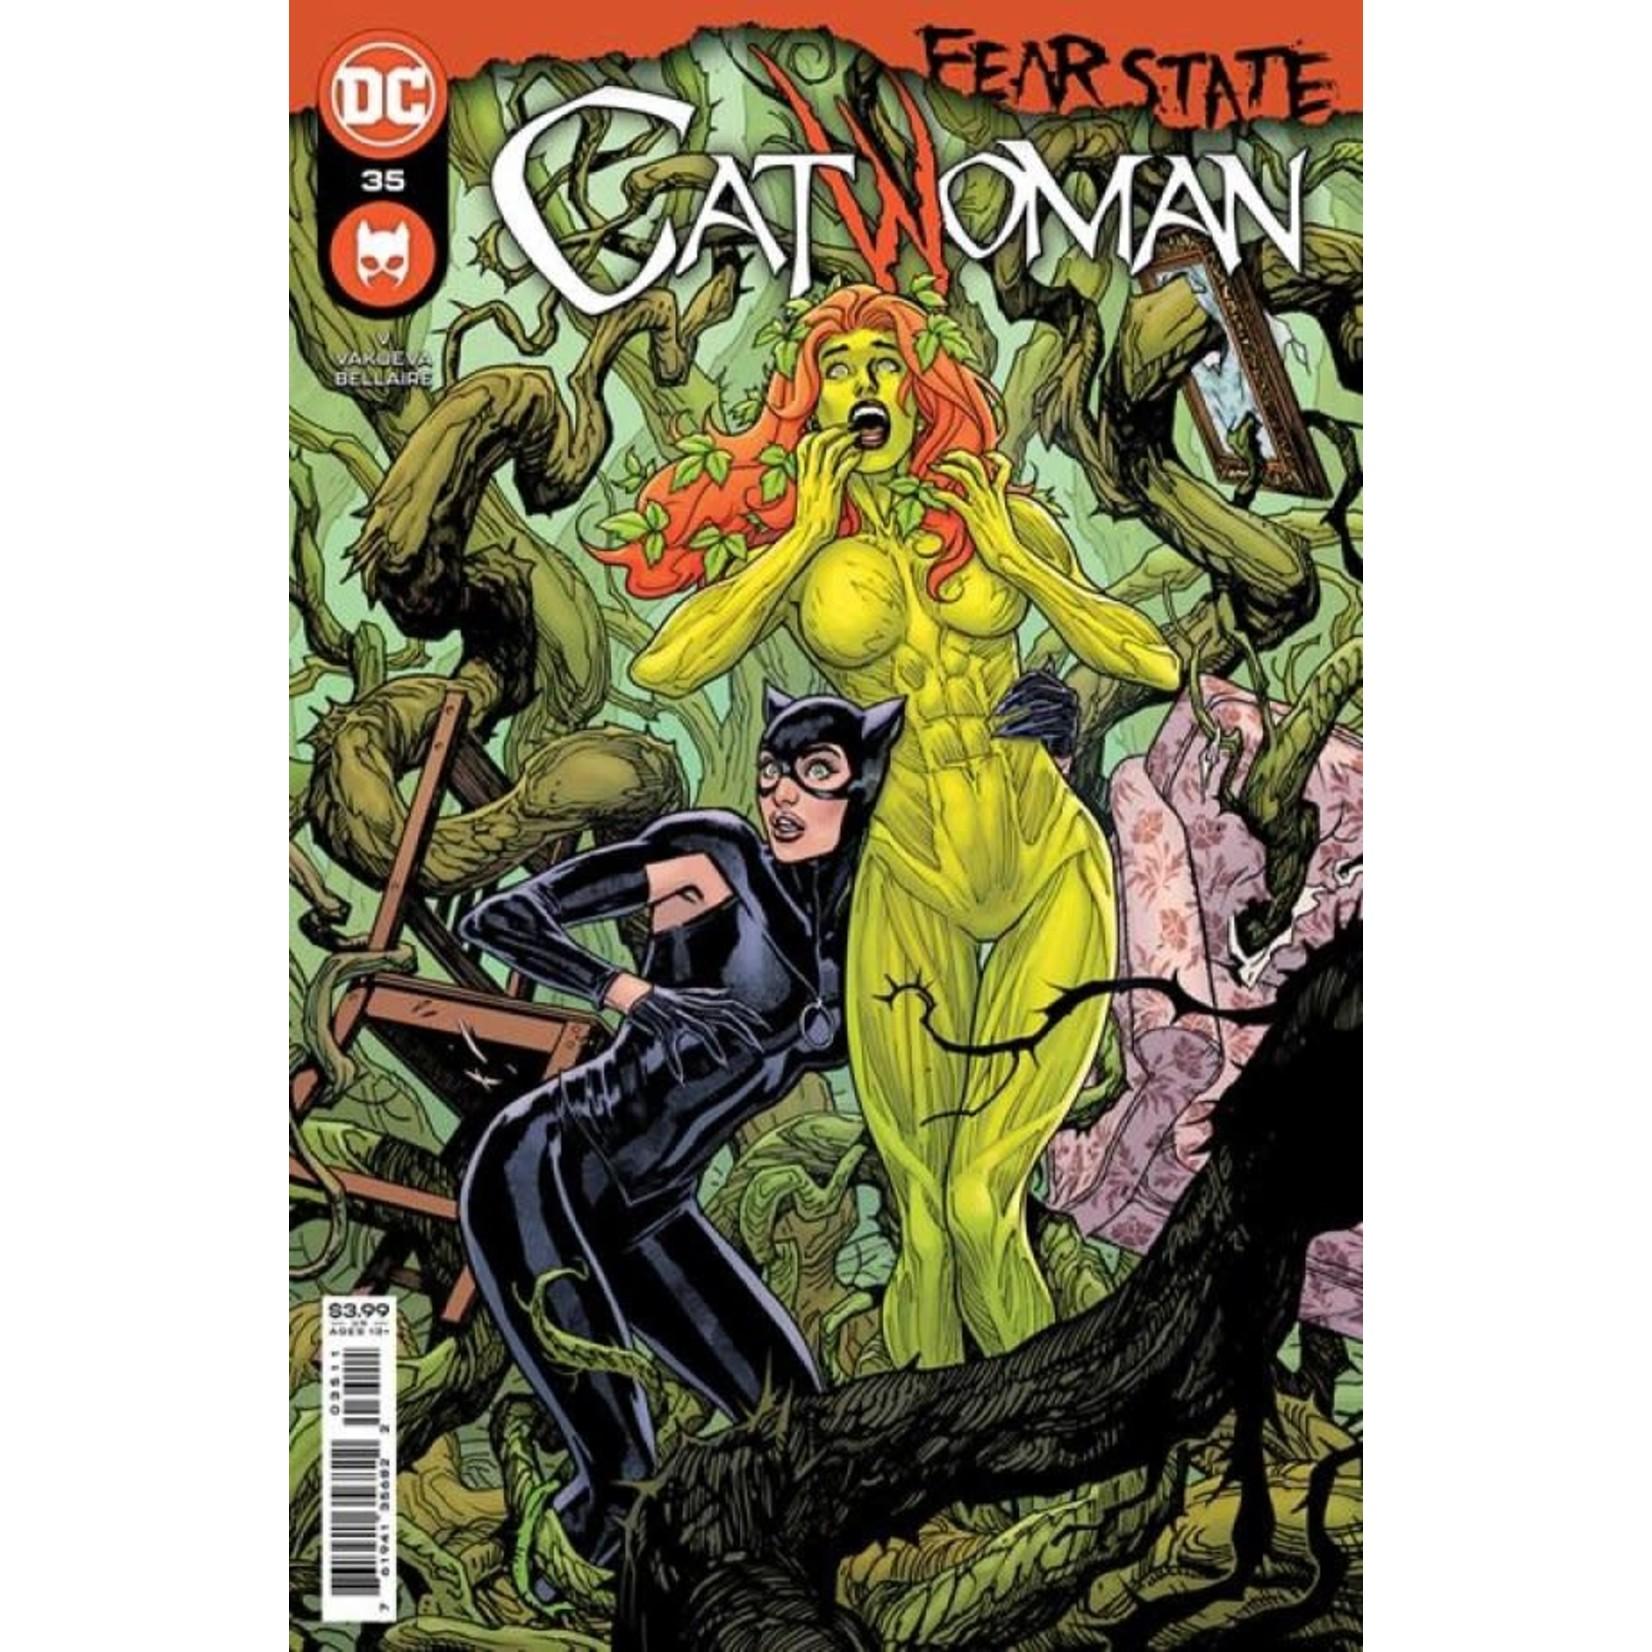 DC Comics Catwoman #35